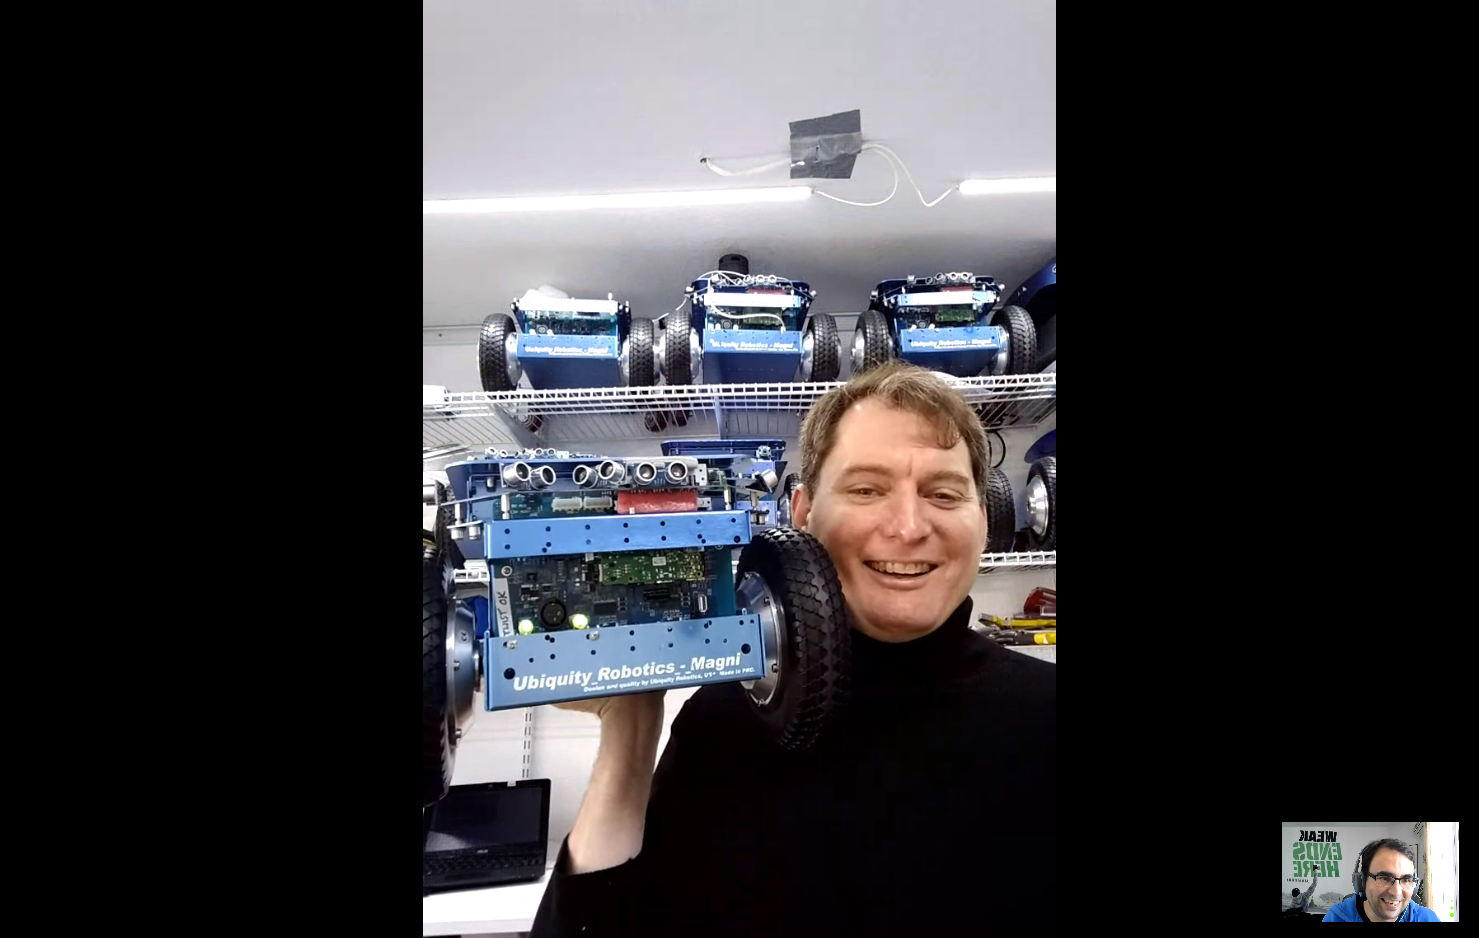 Building robotics products using ROS with David Crawley